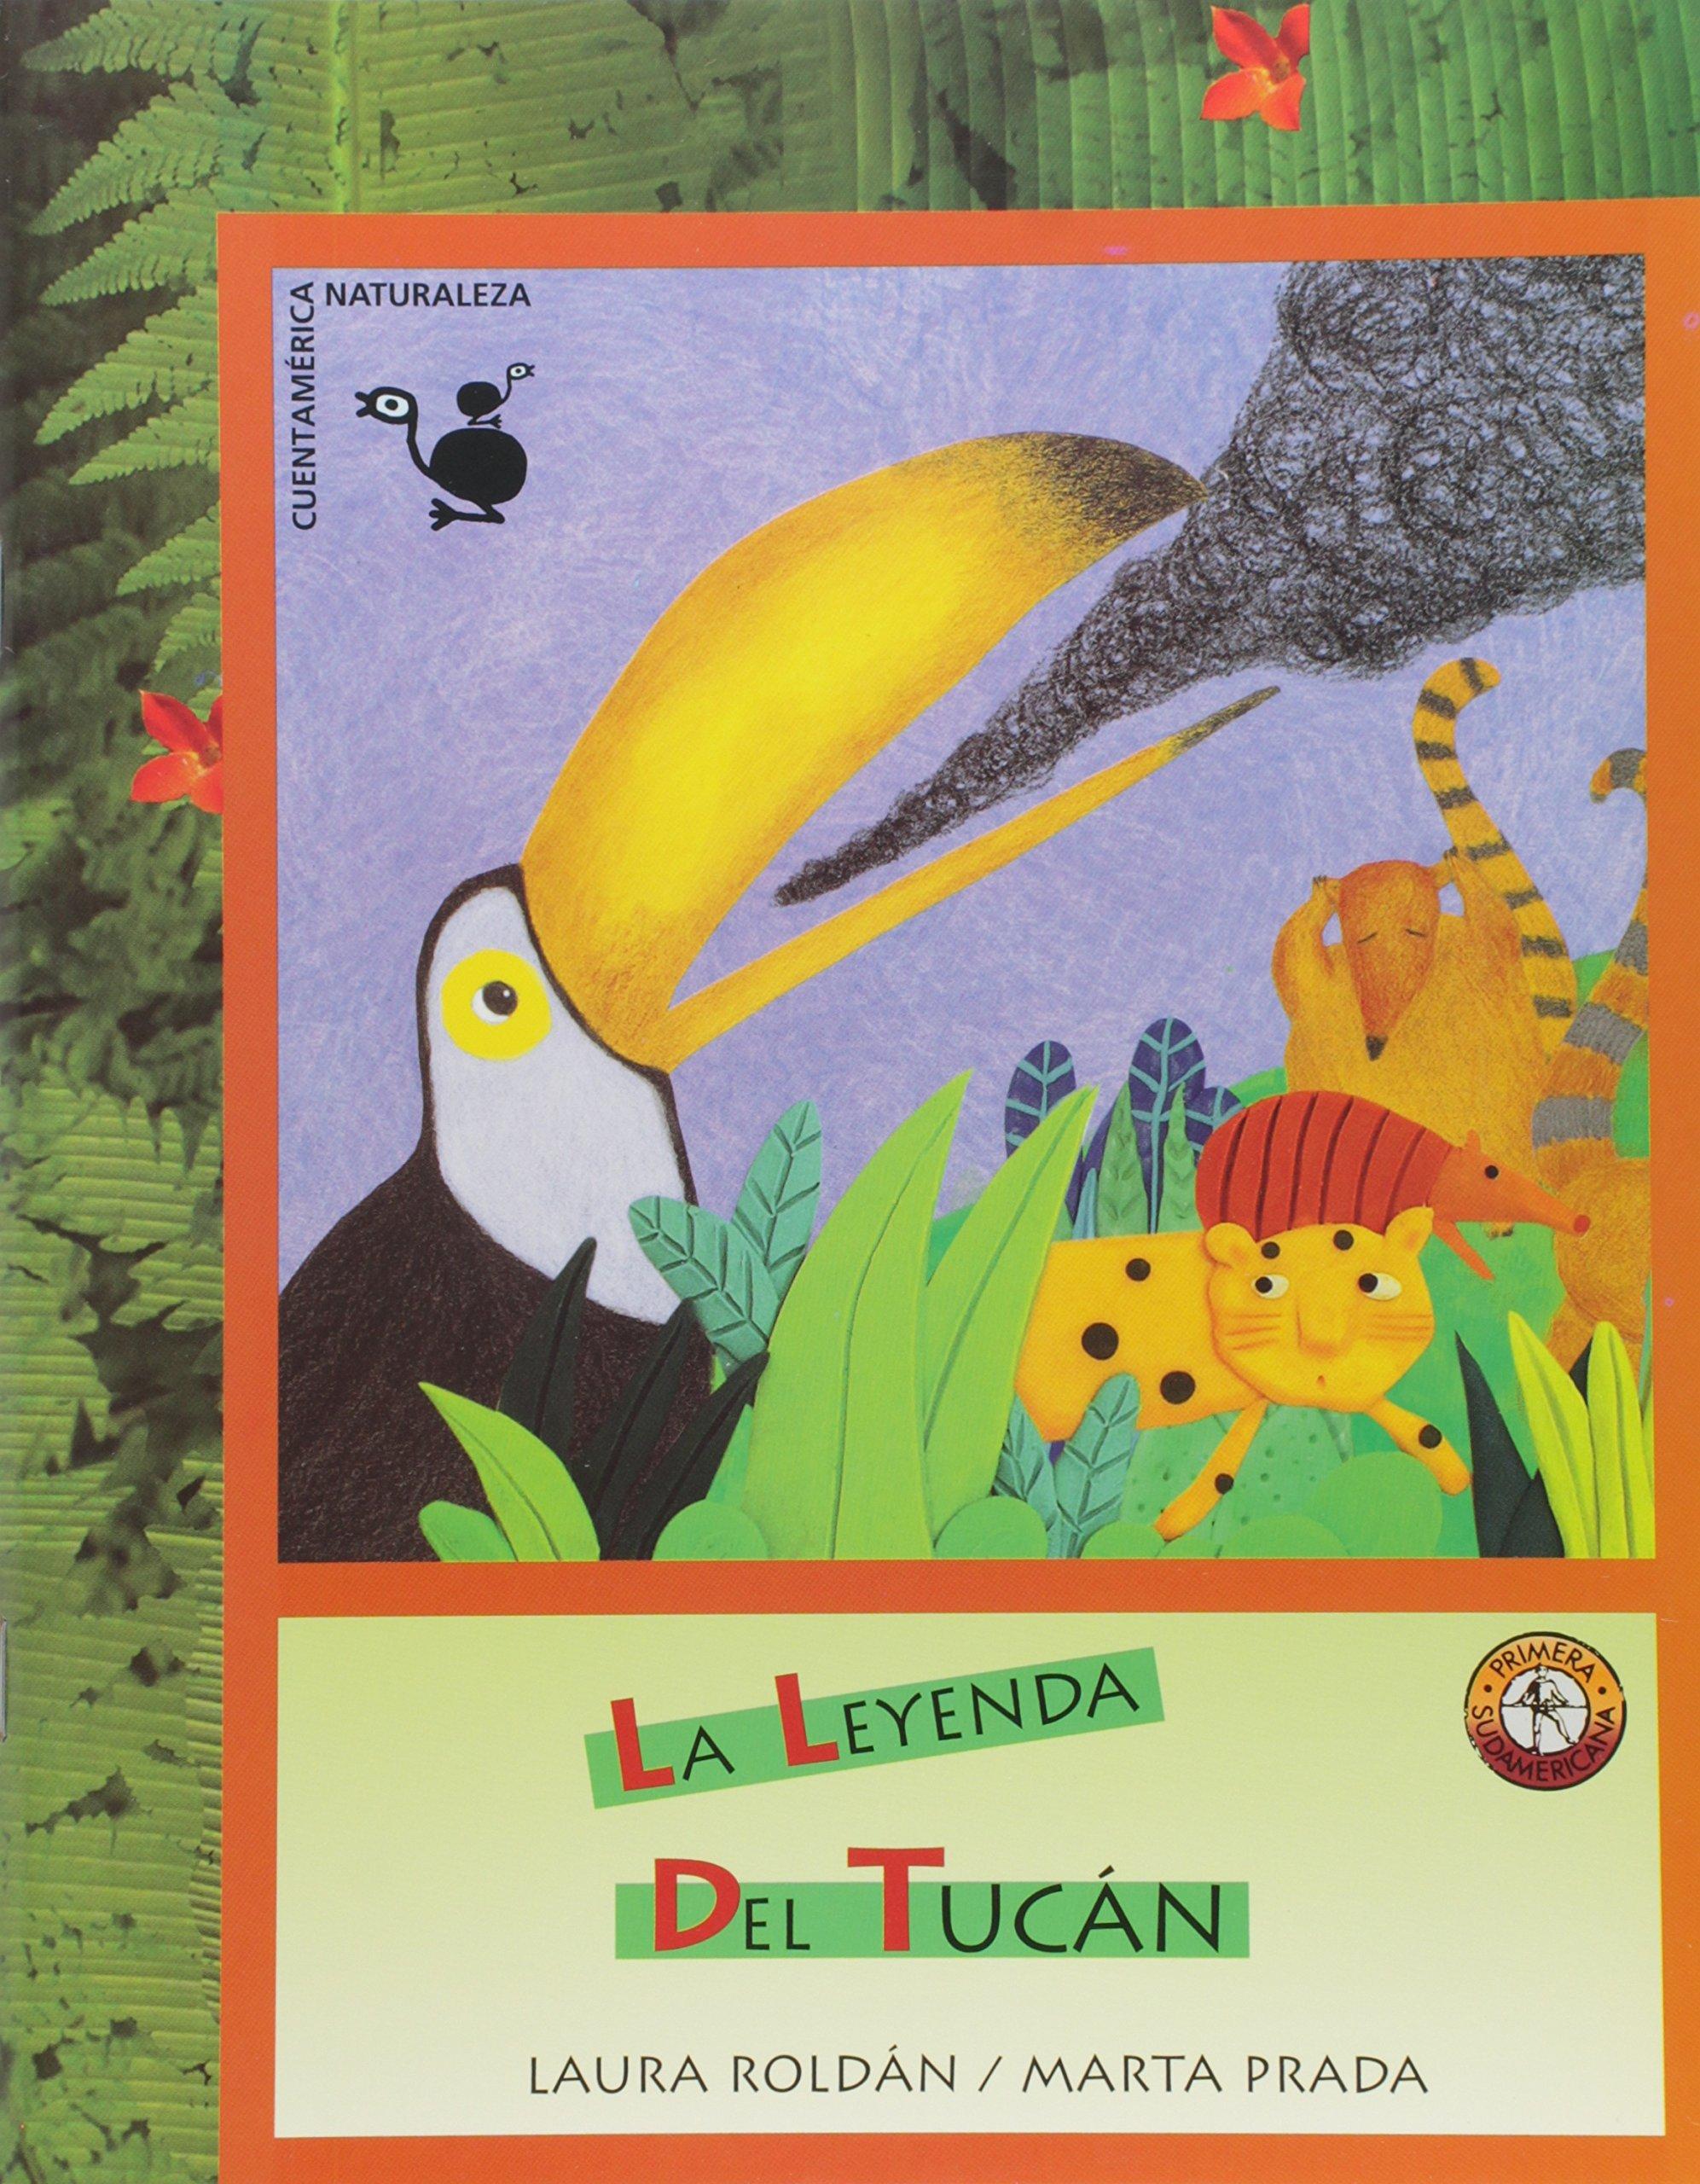 LEYENDA DEL TUCAN, LA (Spanish Edition): ROLDAN: 9789500730846: Amazon.com: Books